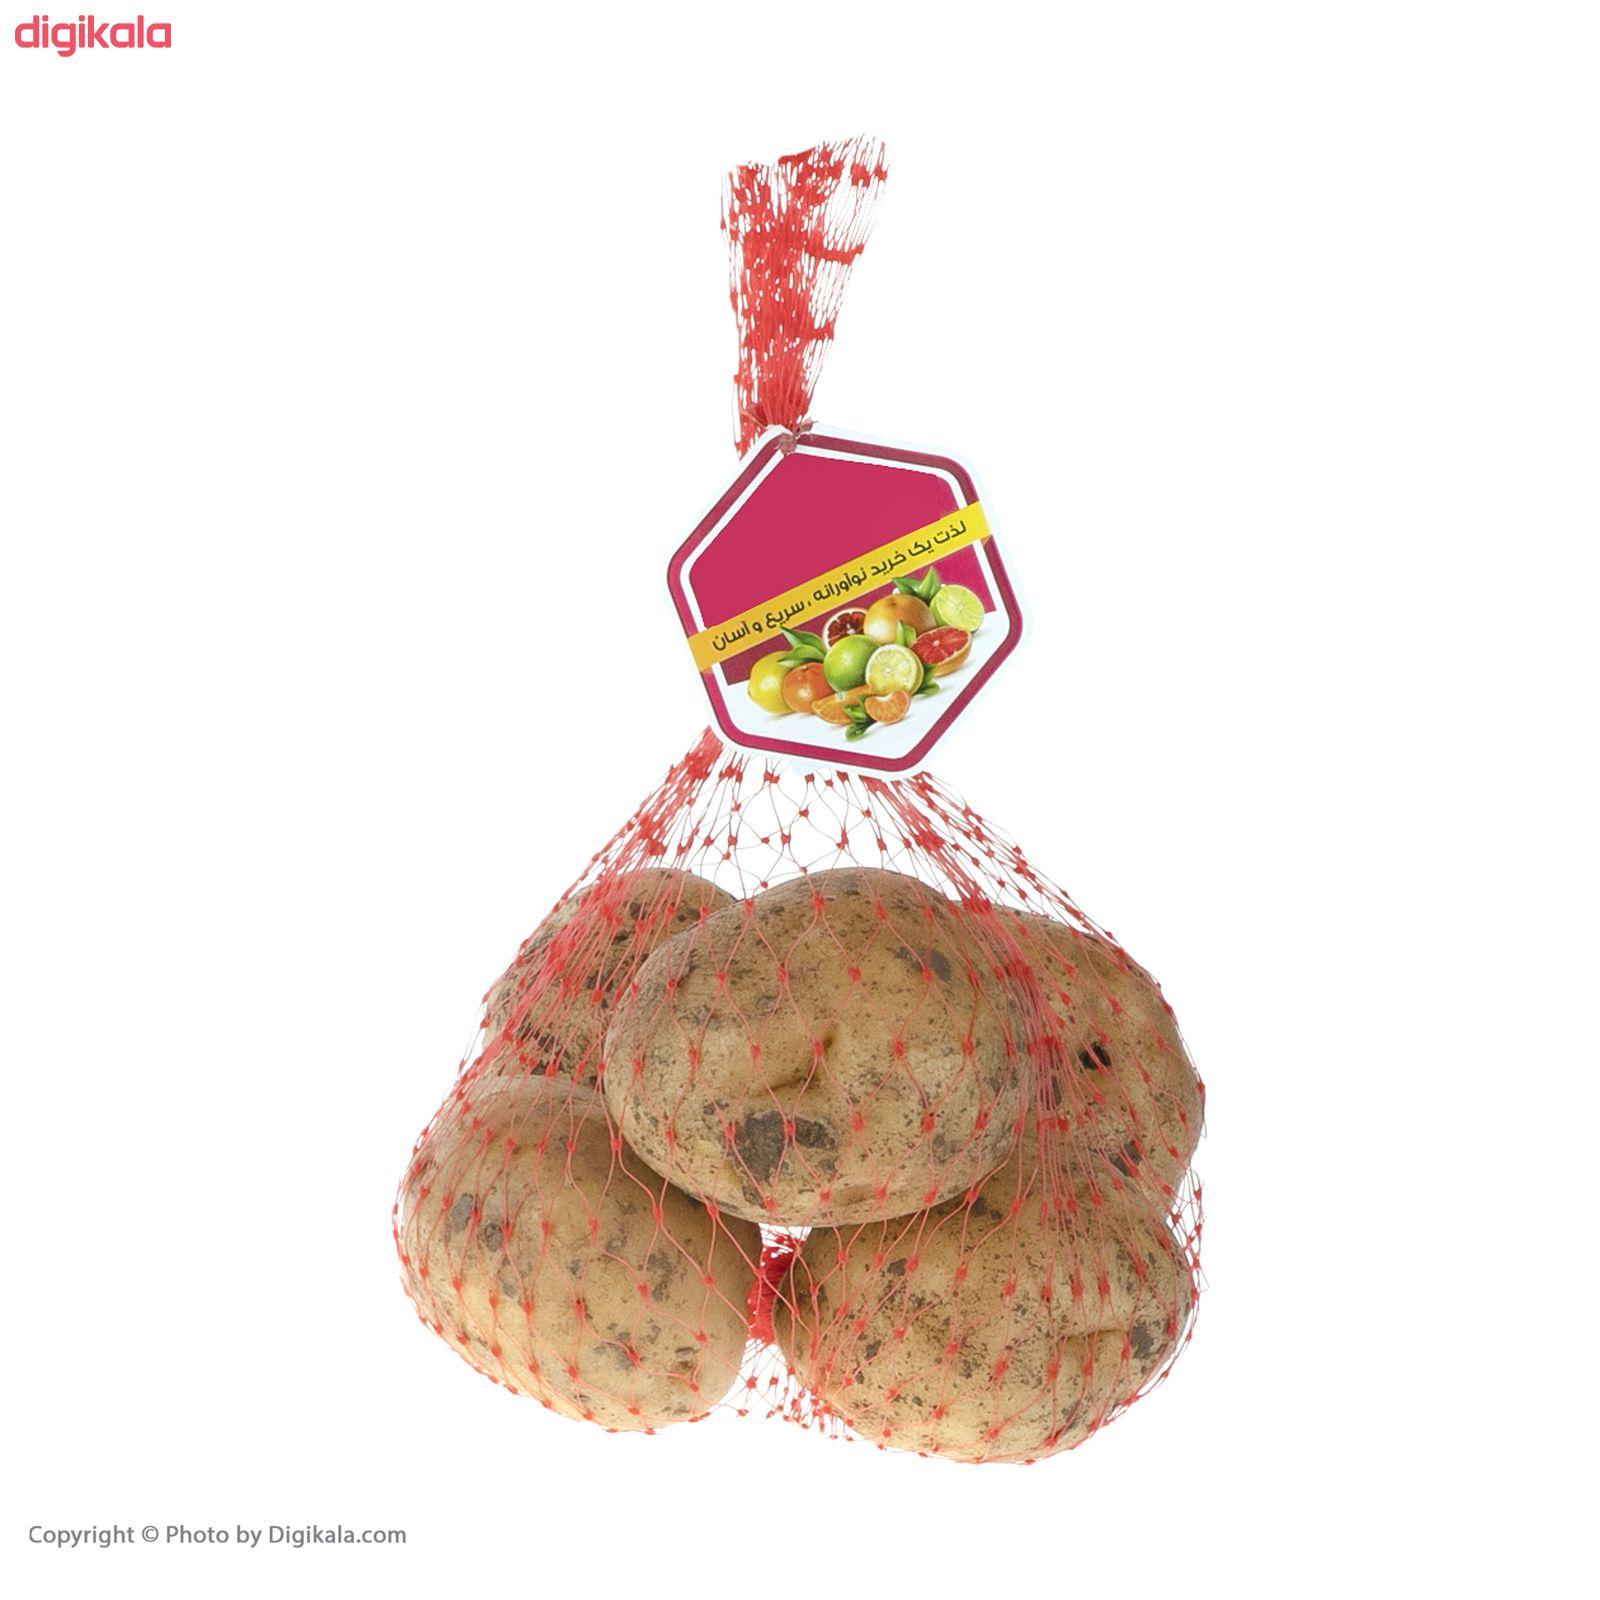 سیب زمینی میوه پلاس - 1 کیلوگرم main 1 3